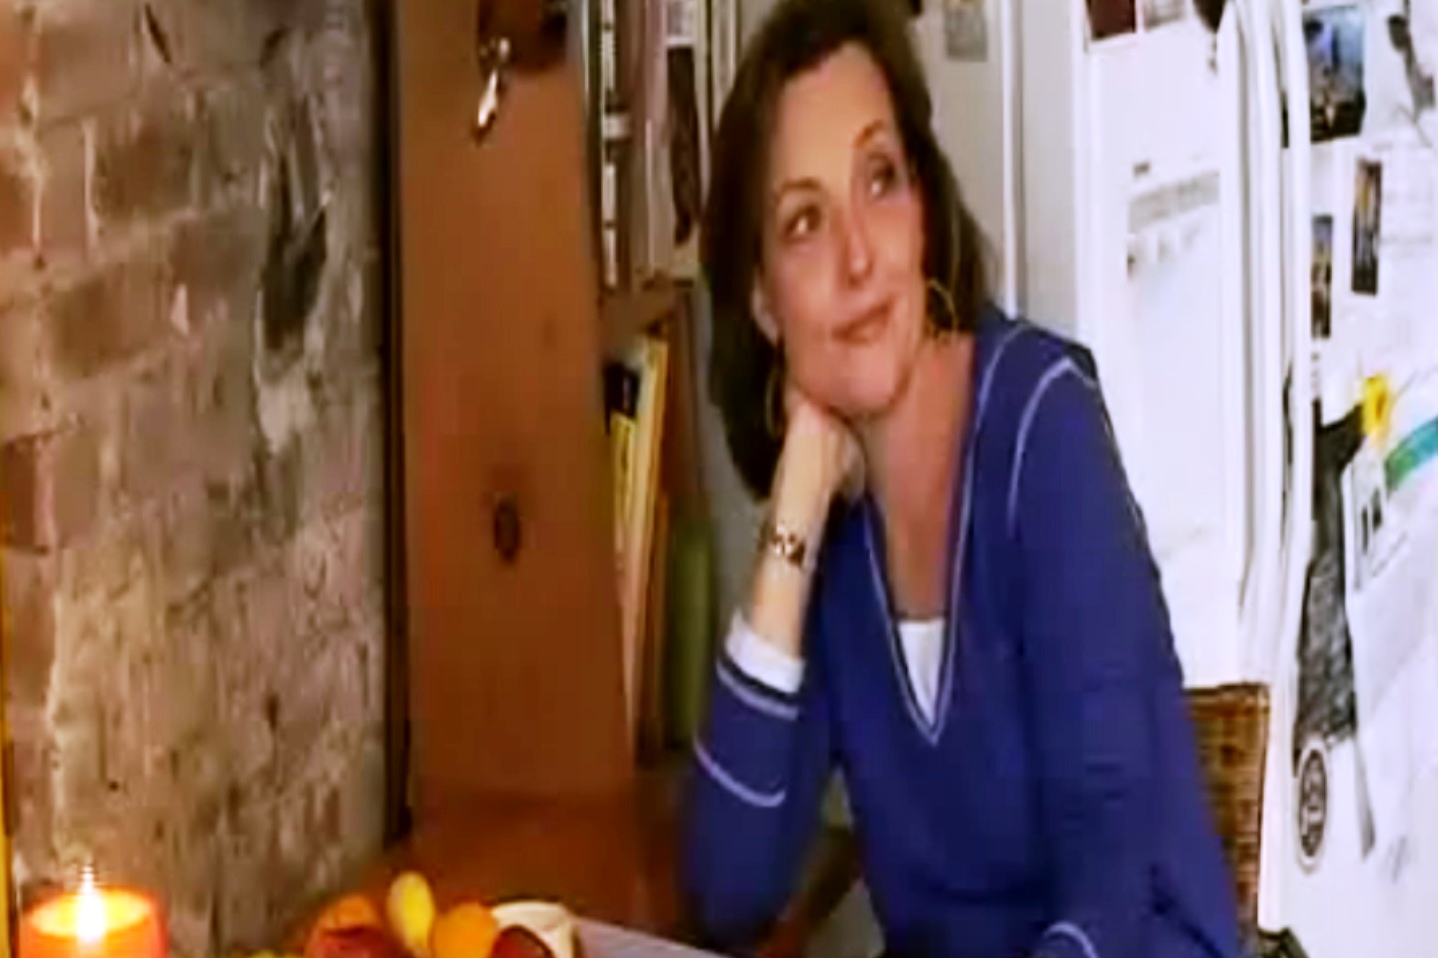 AnneBonnieA